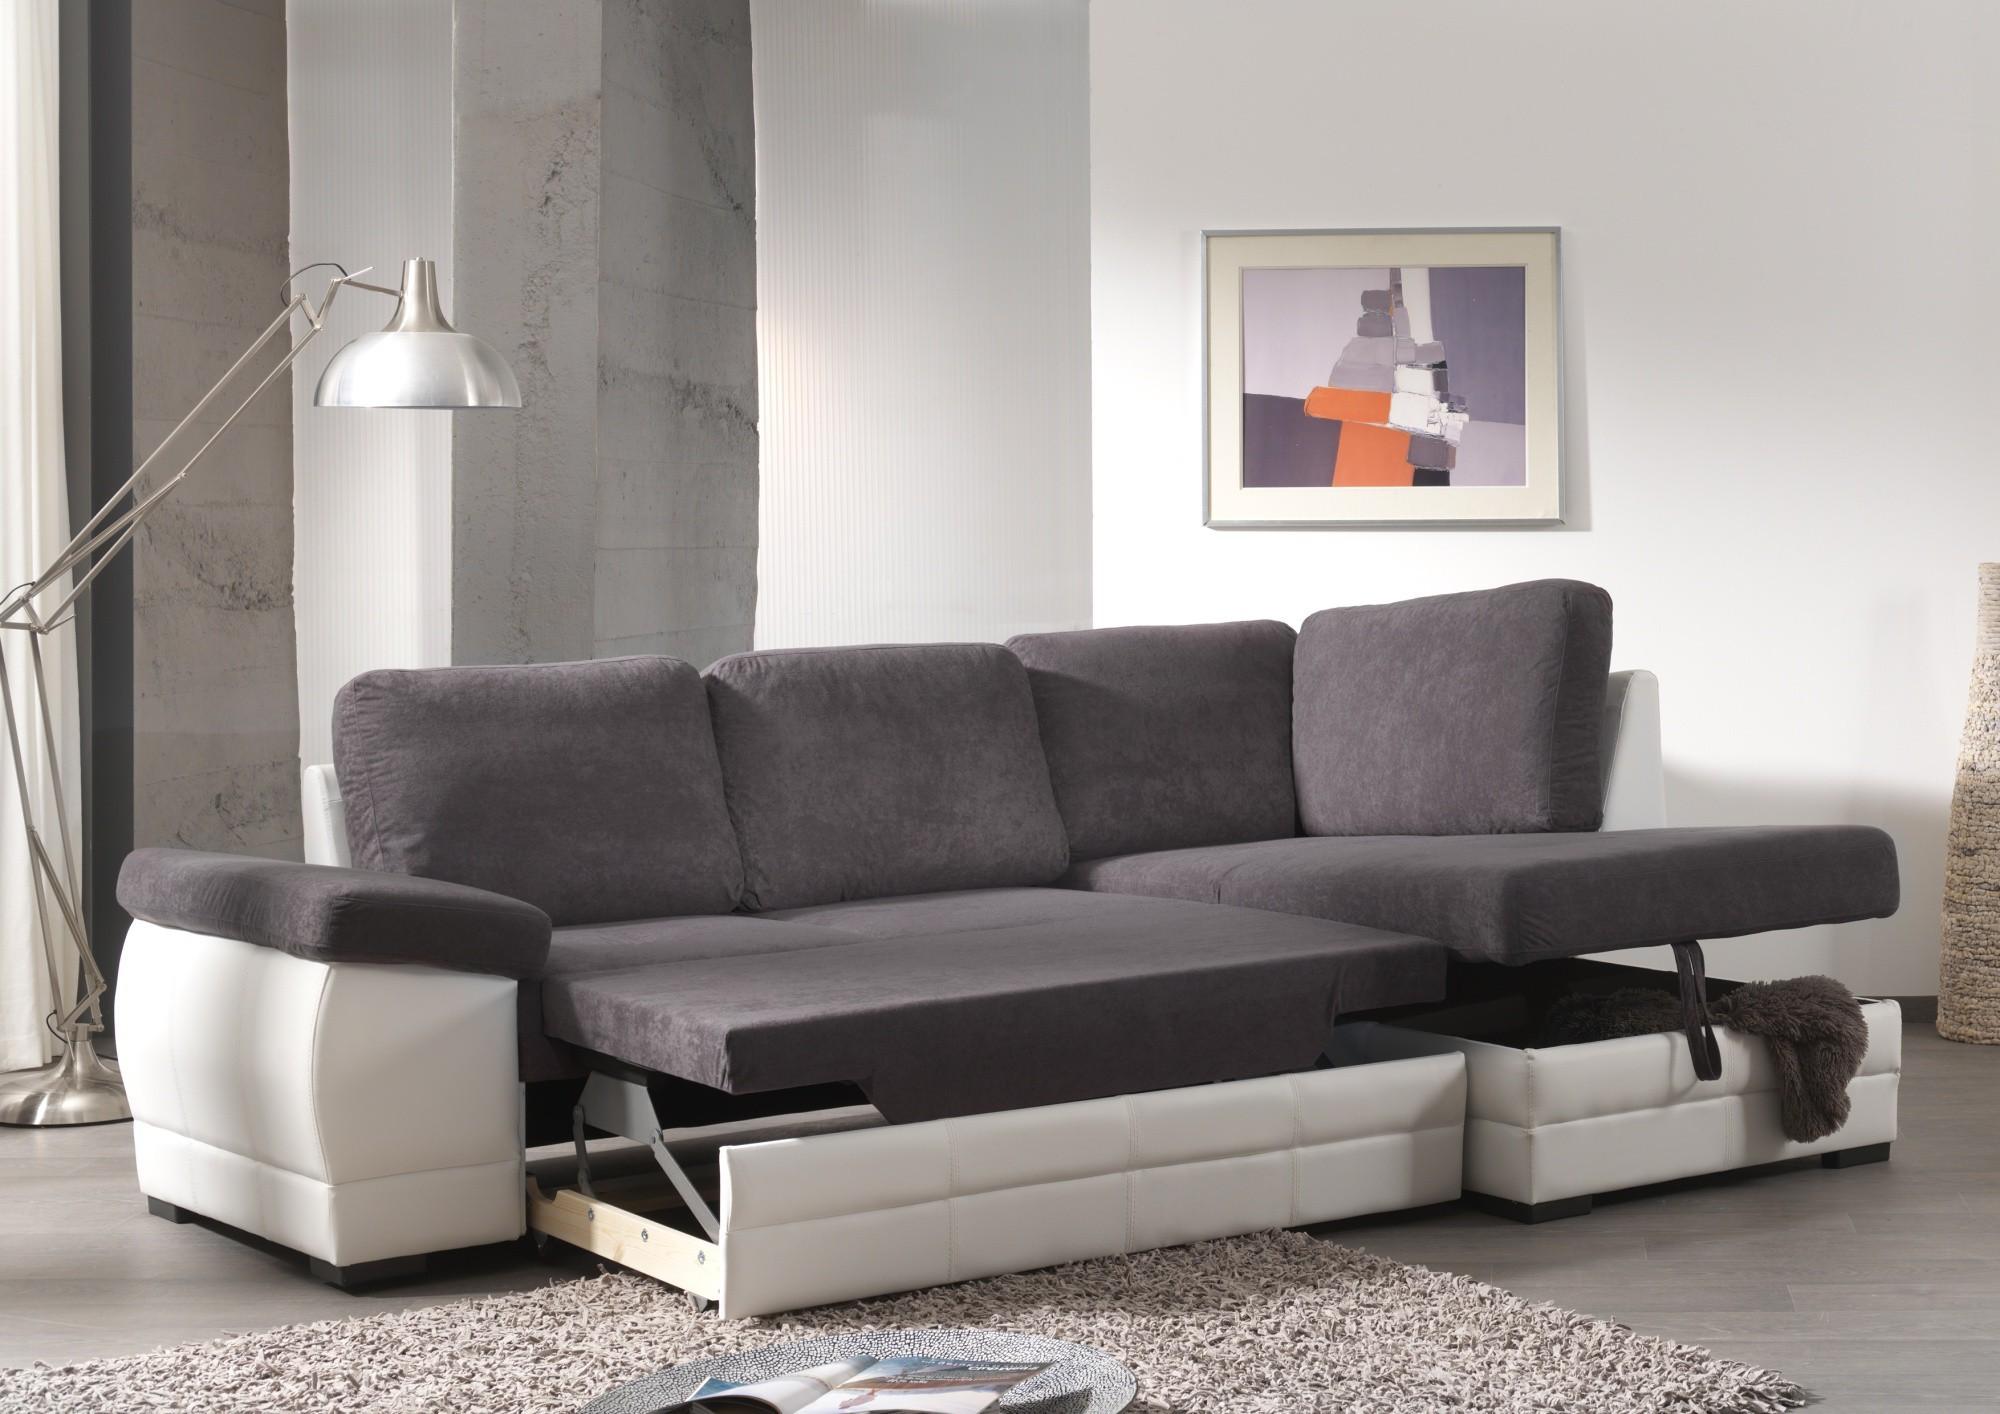 Canapé D'angle Convertible Blanc Gris